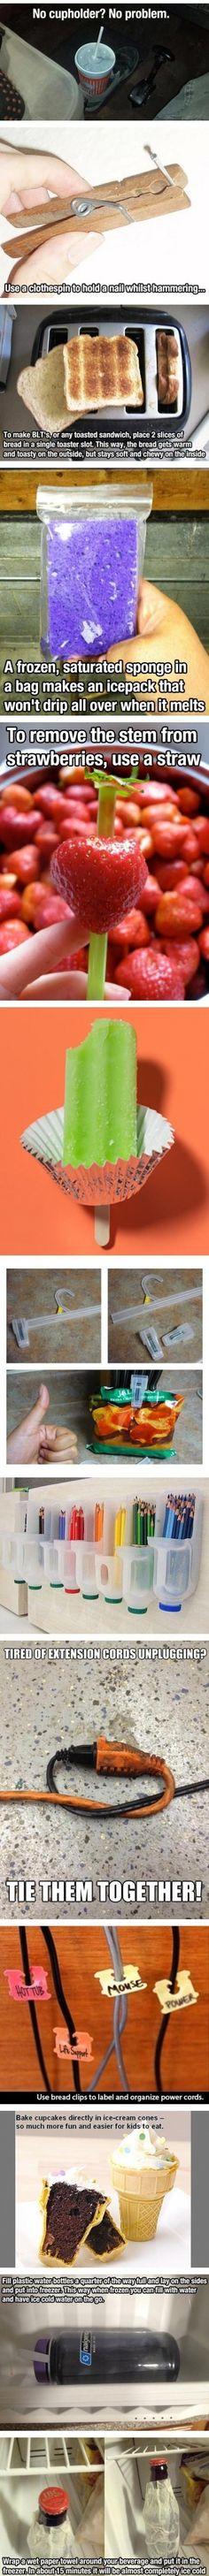 Some useful ideas!